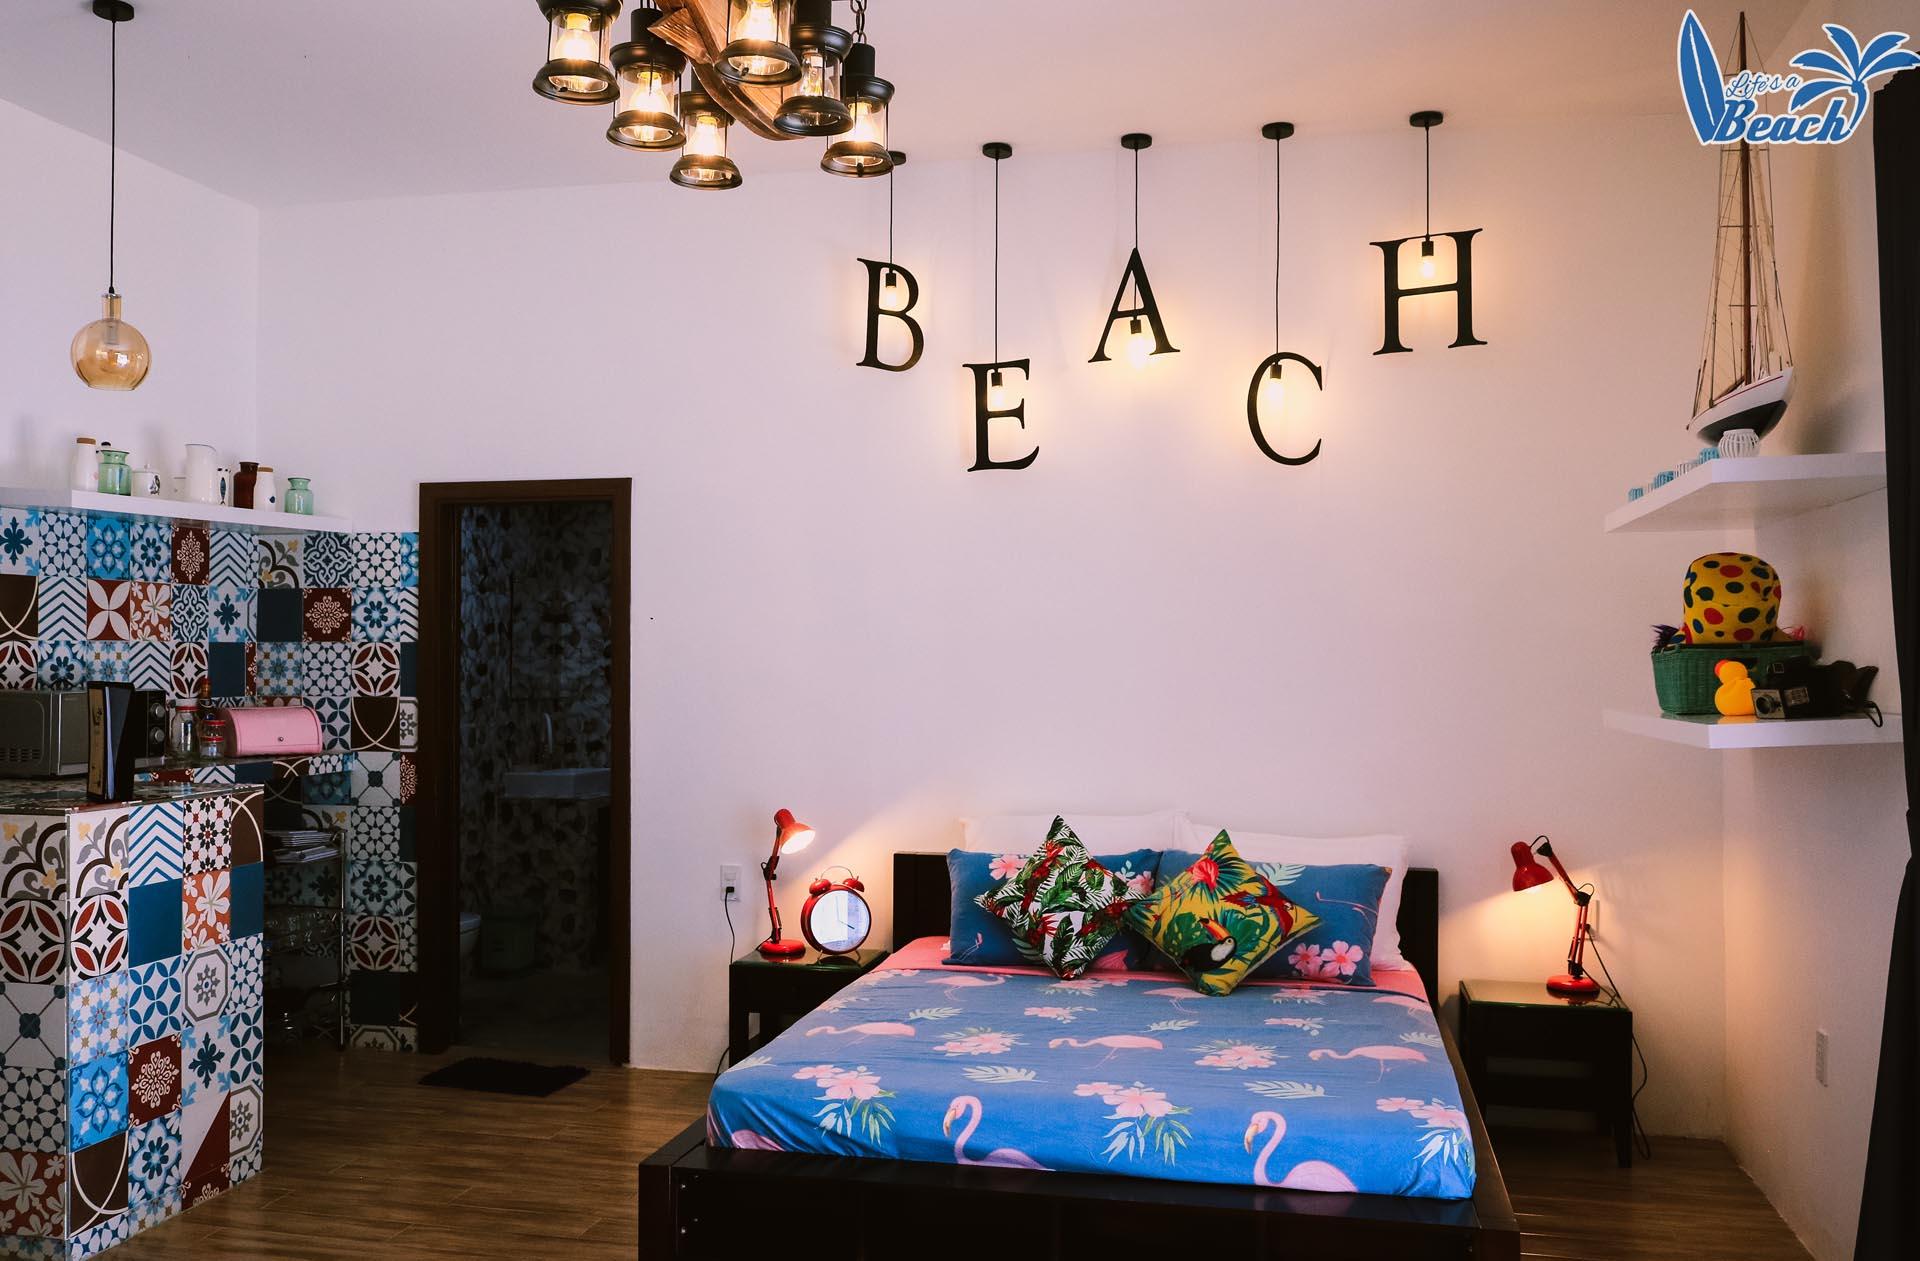 Life's a Beach Vietnam Ky Co Room Image 6 - mobile